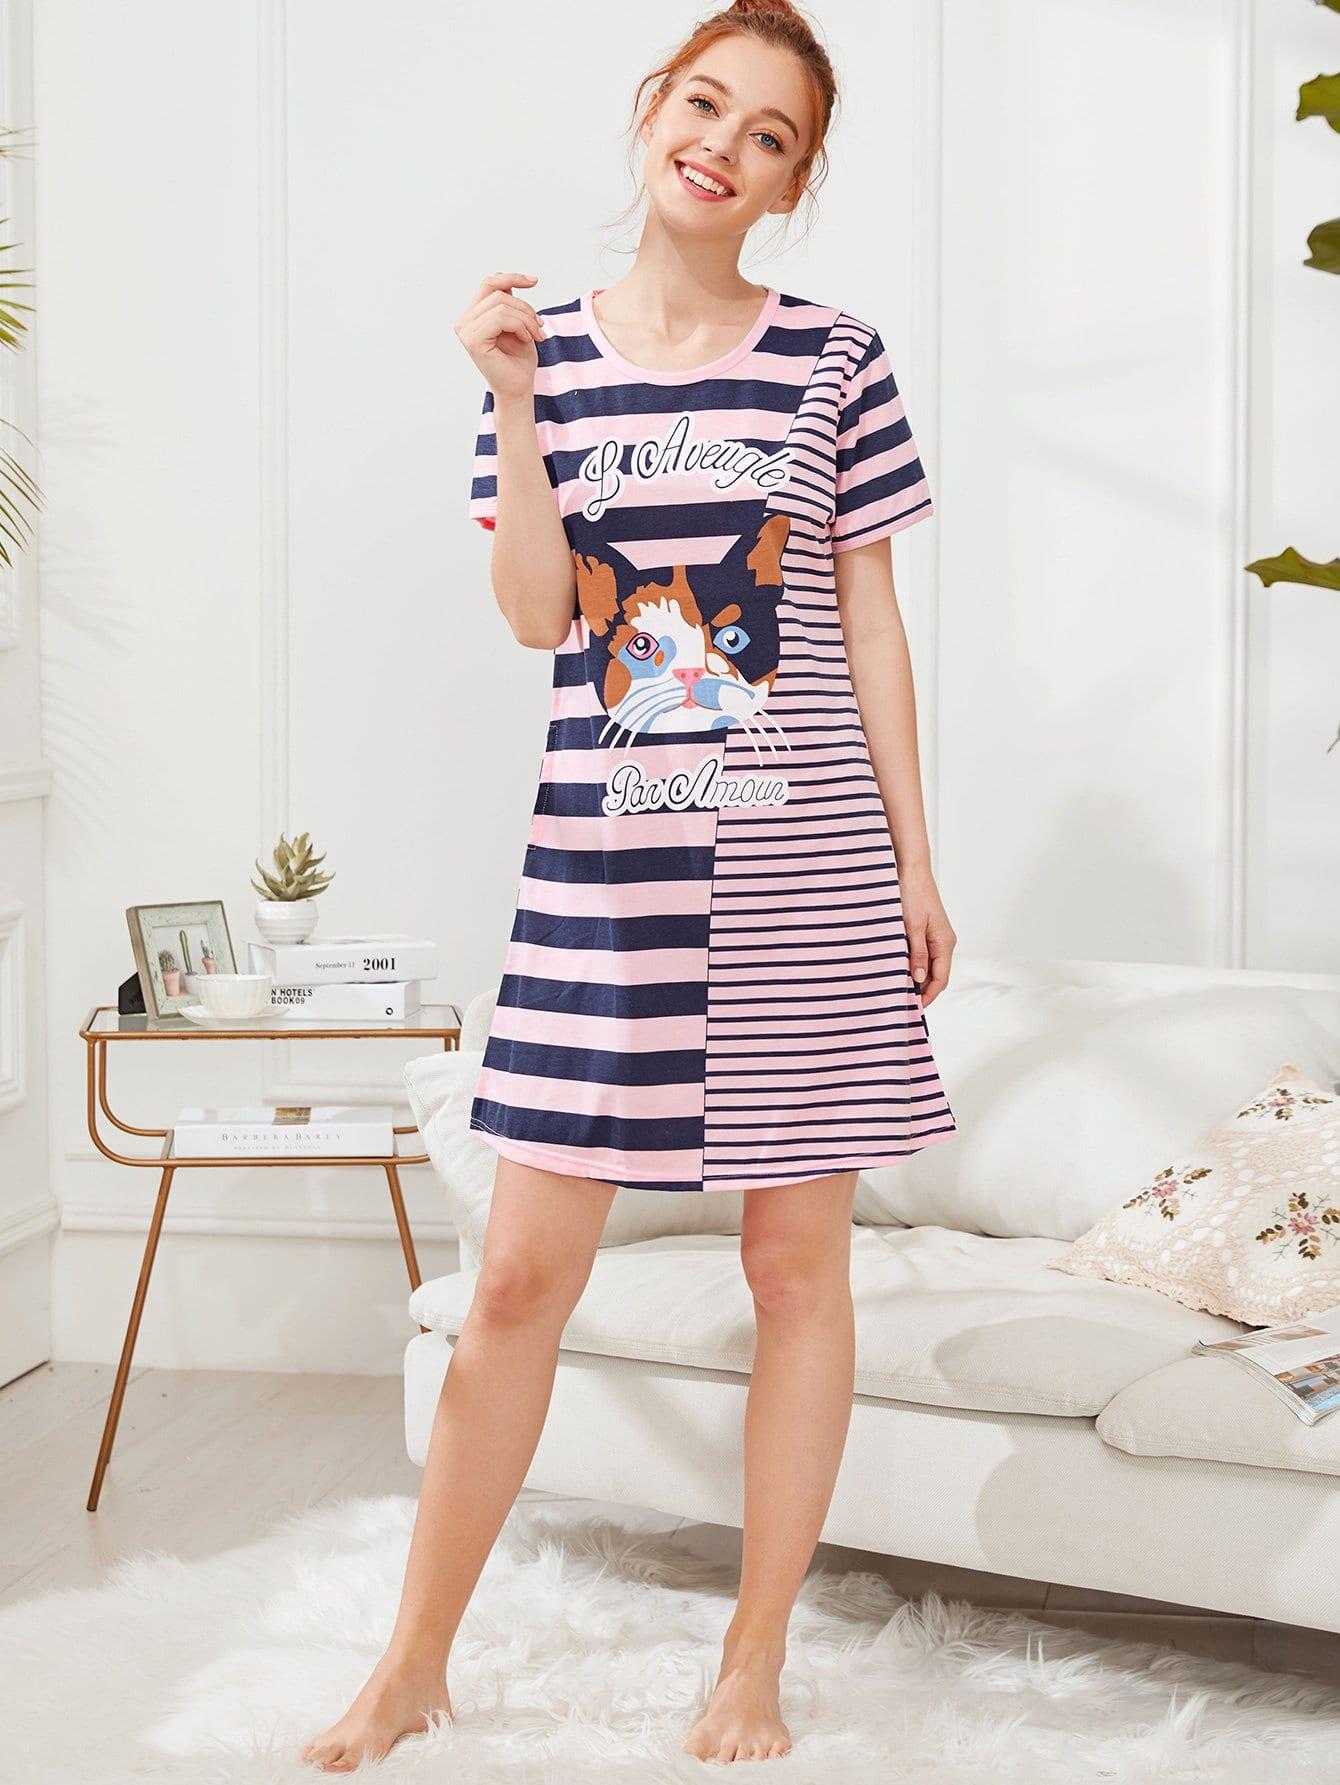 Animal Print Striped Dress exmork 100 вт 12 в poly si